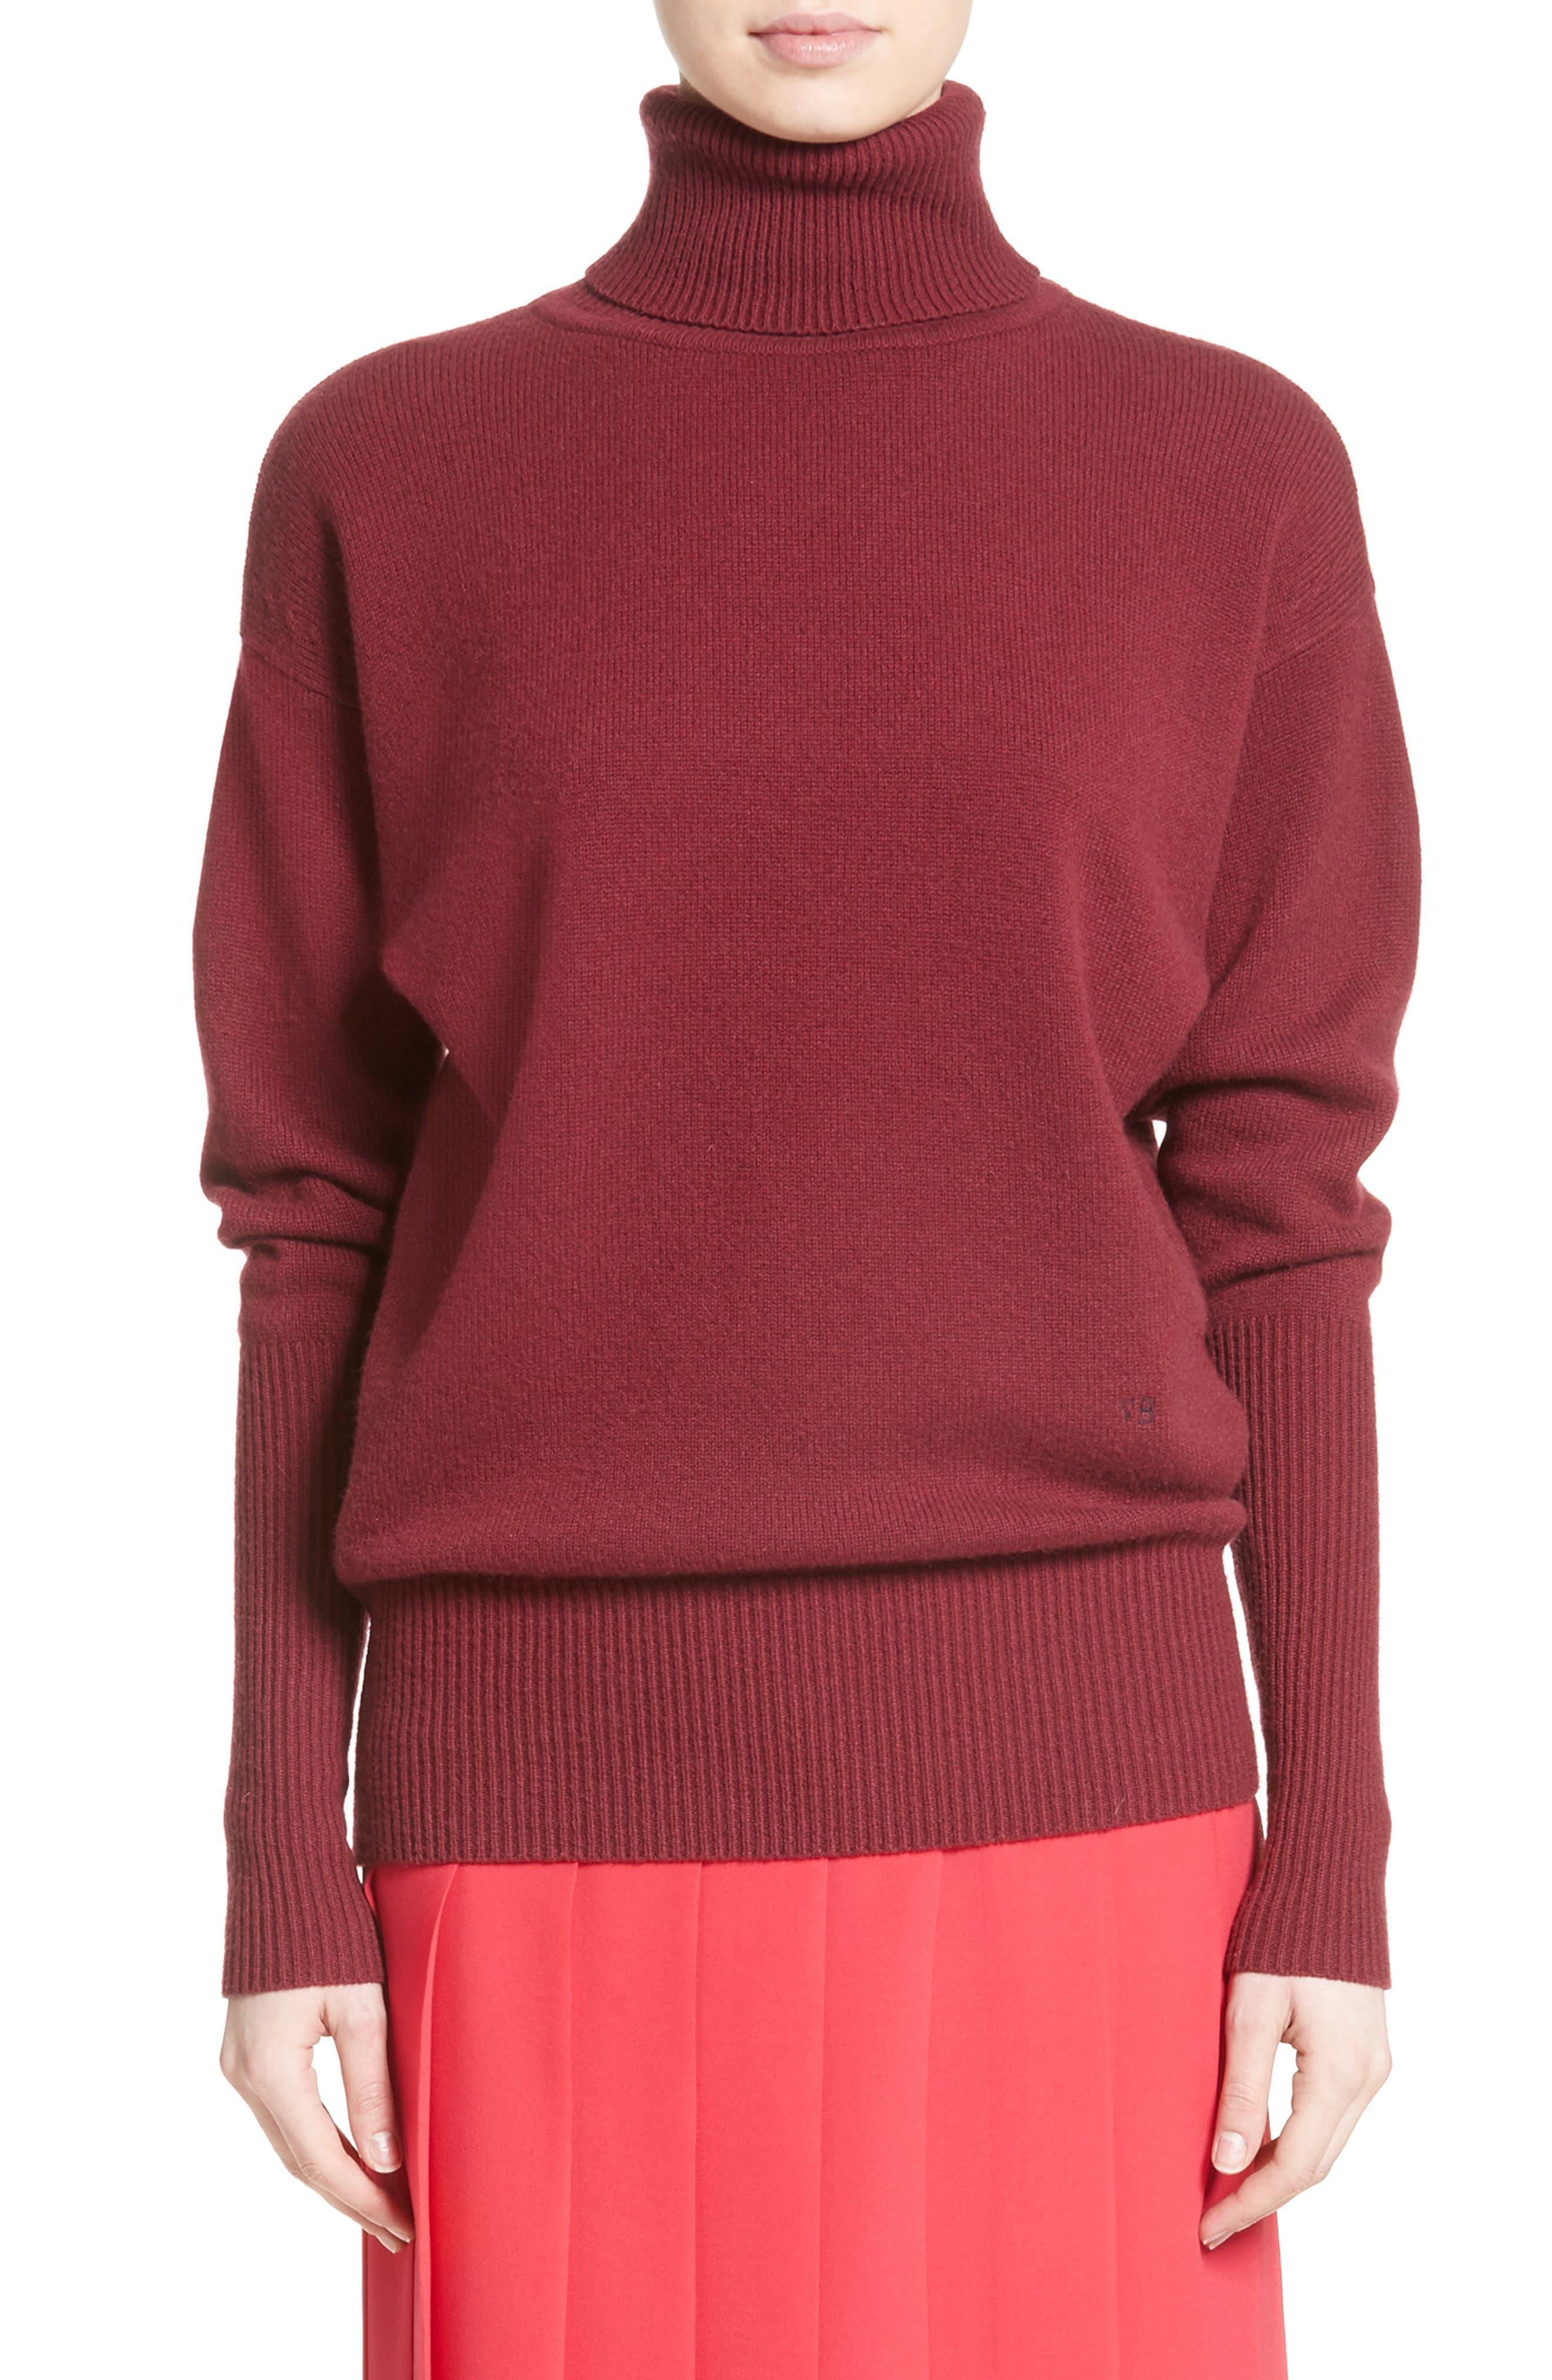 Cashmere Turtleneck Sweater,                         Main,                         color, Cherry